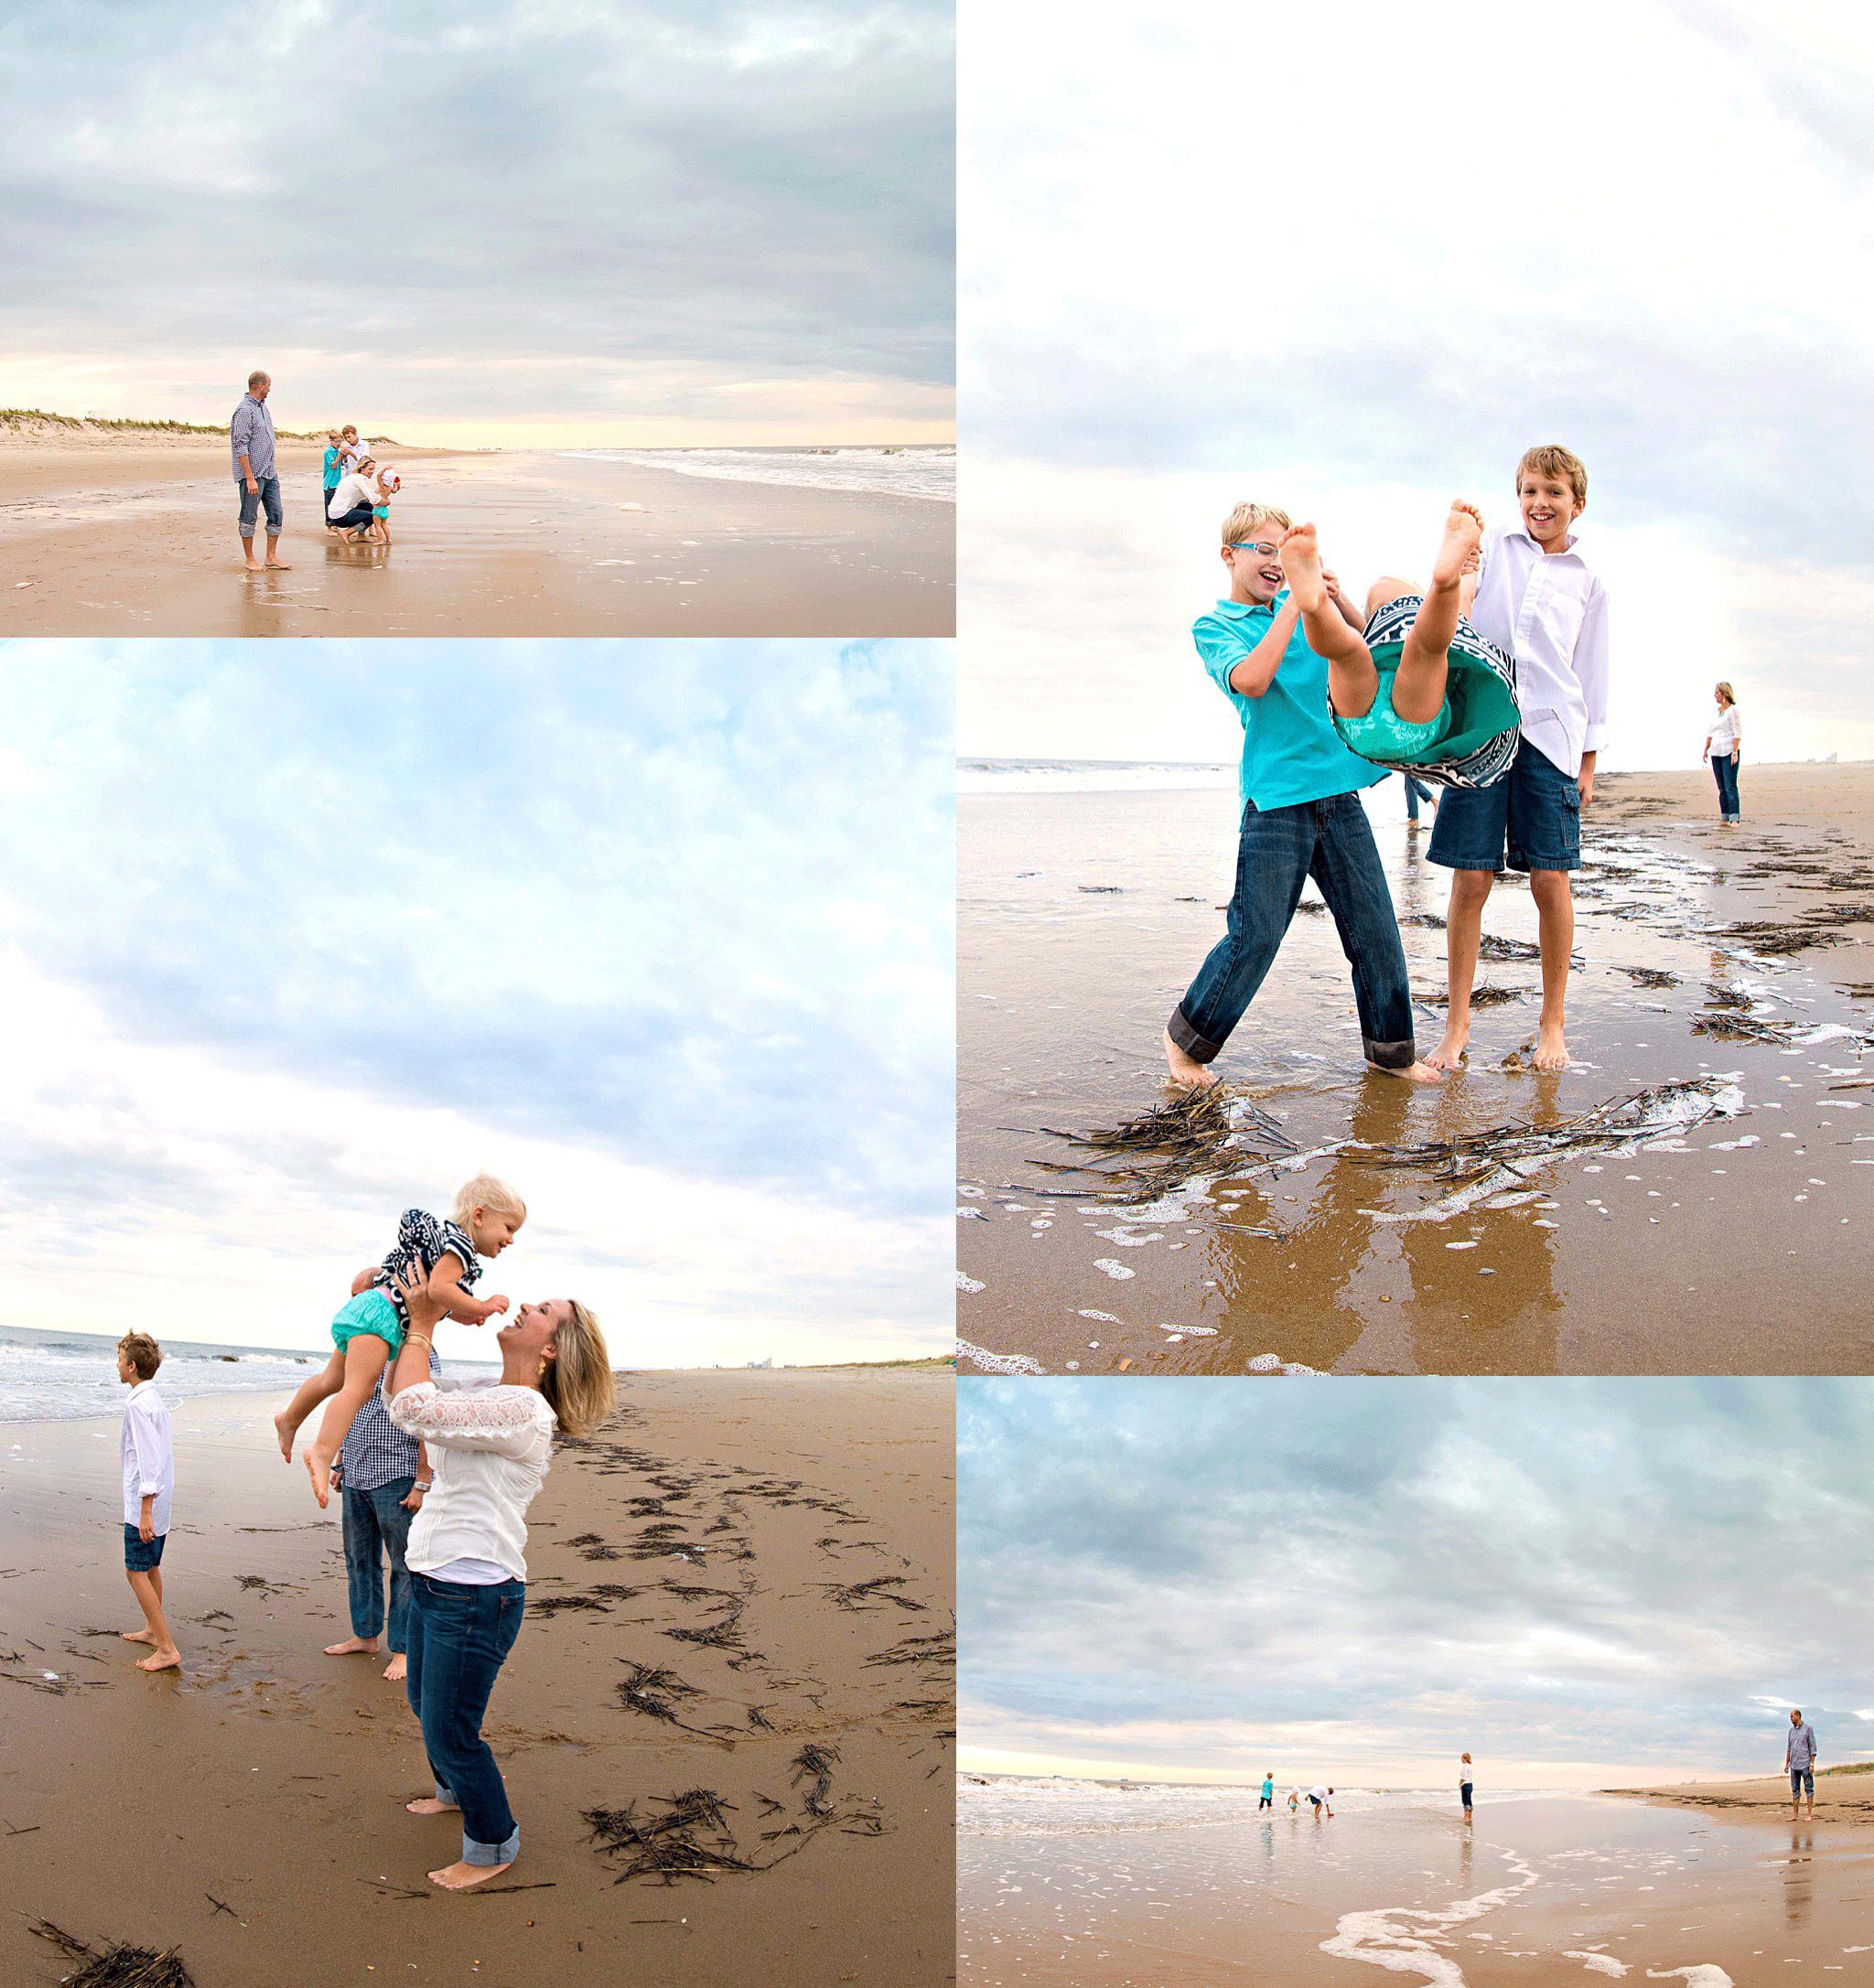 virginia-beach-photographers-sandbridge-family-vacation-photo-session-melissa-bliss-photography-hampton-roads-photographer.png